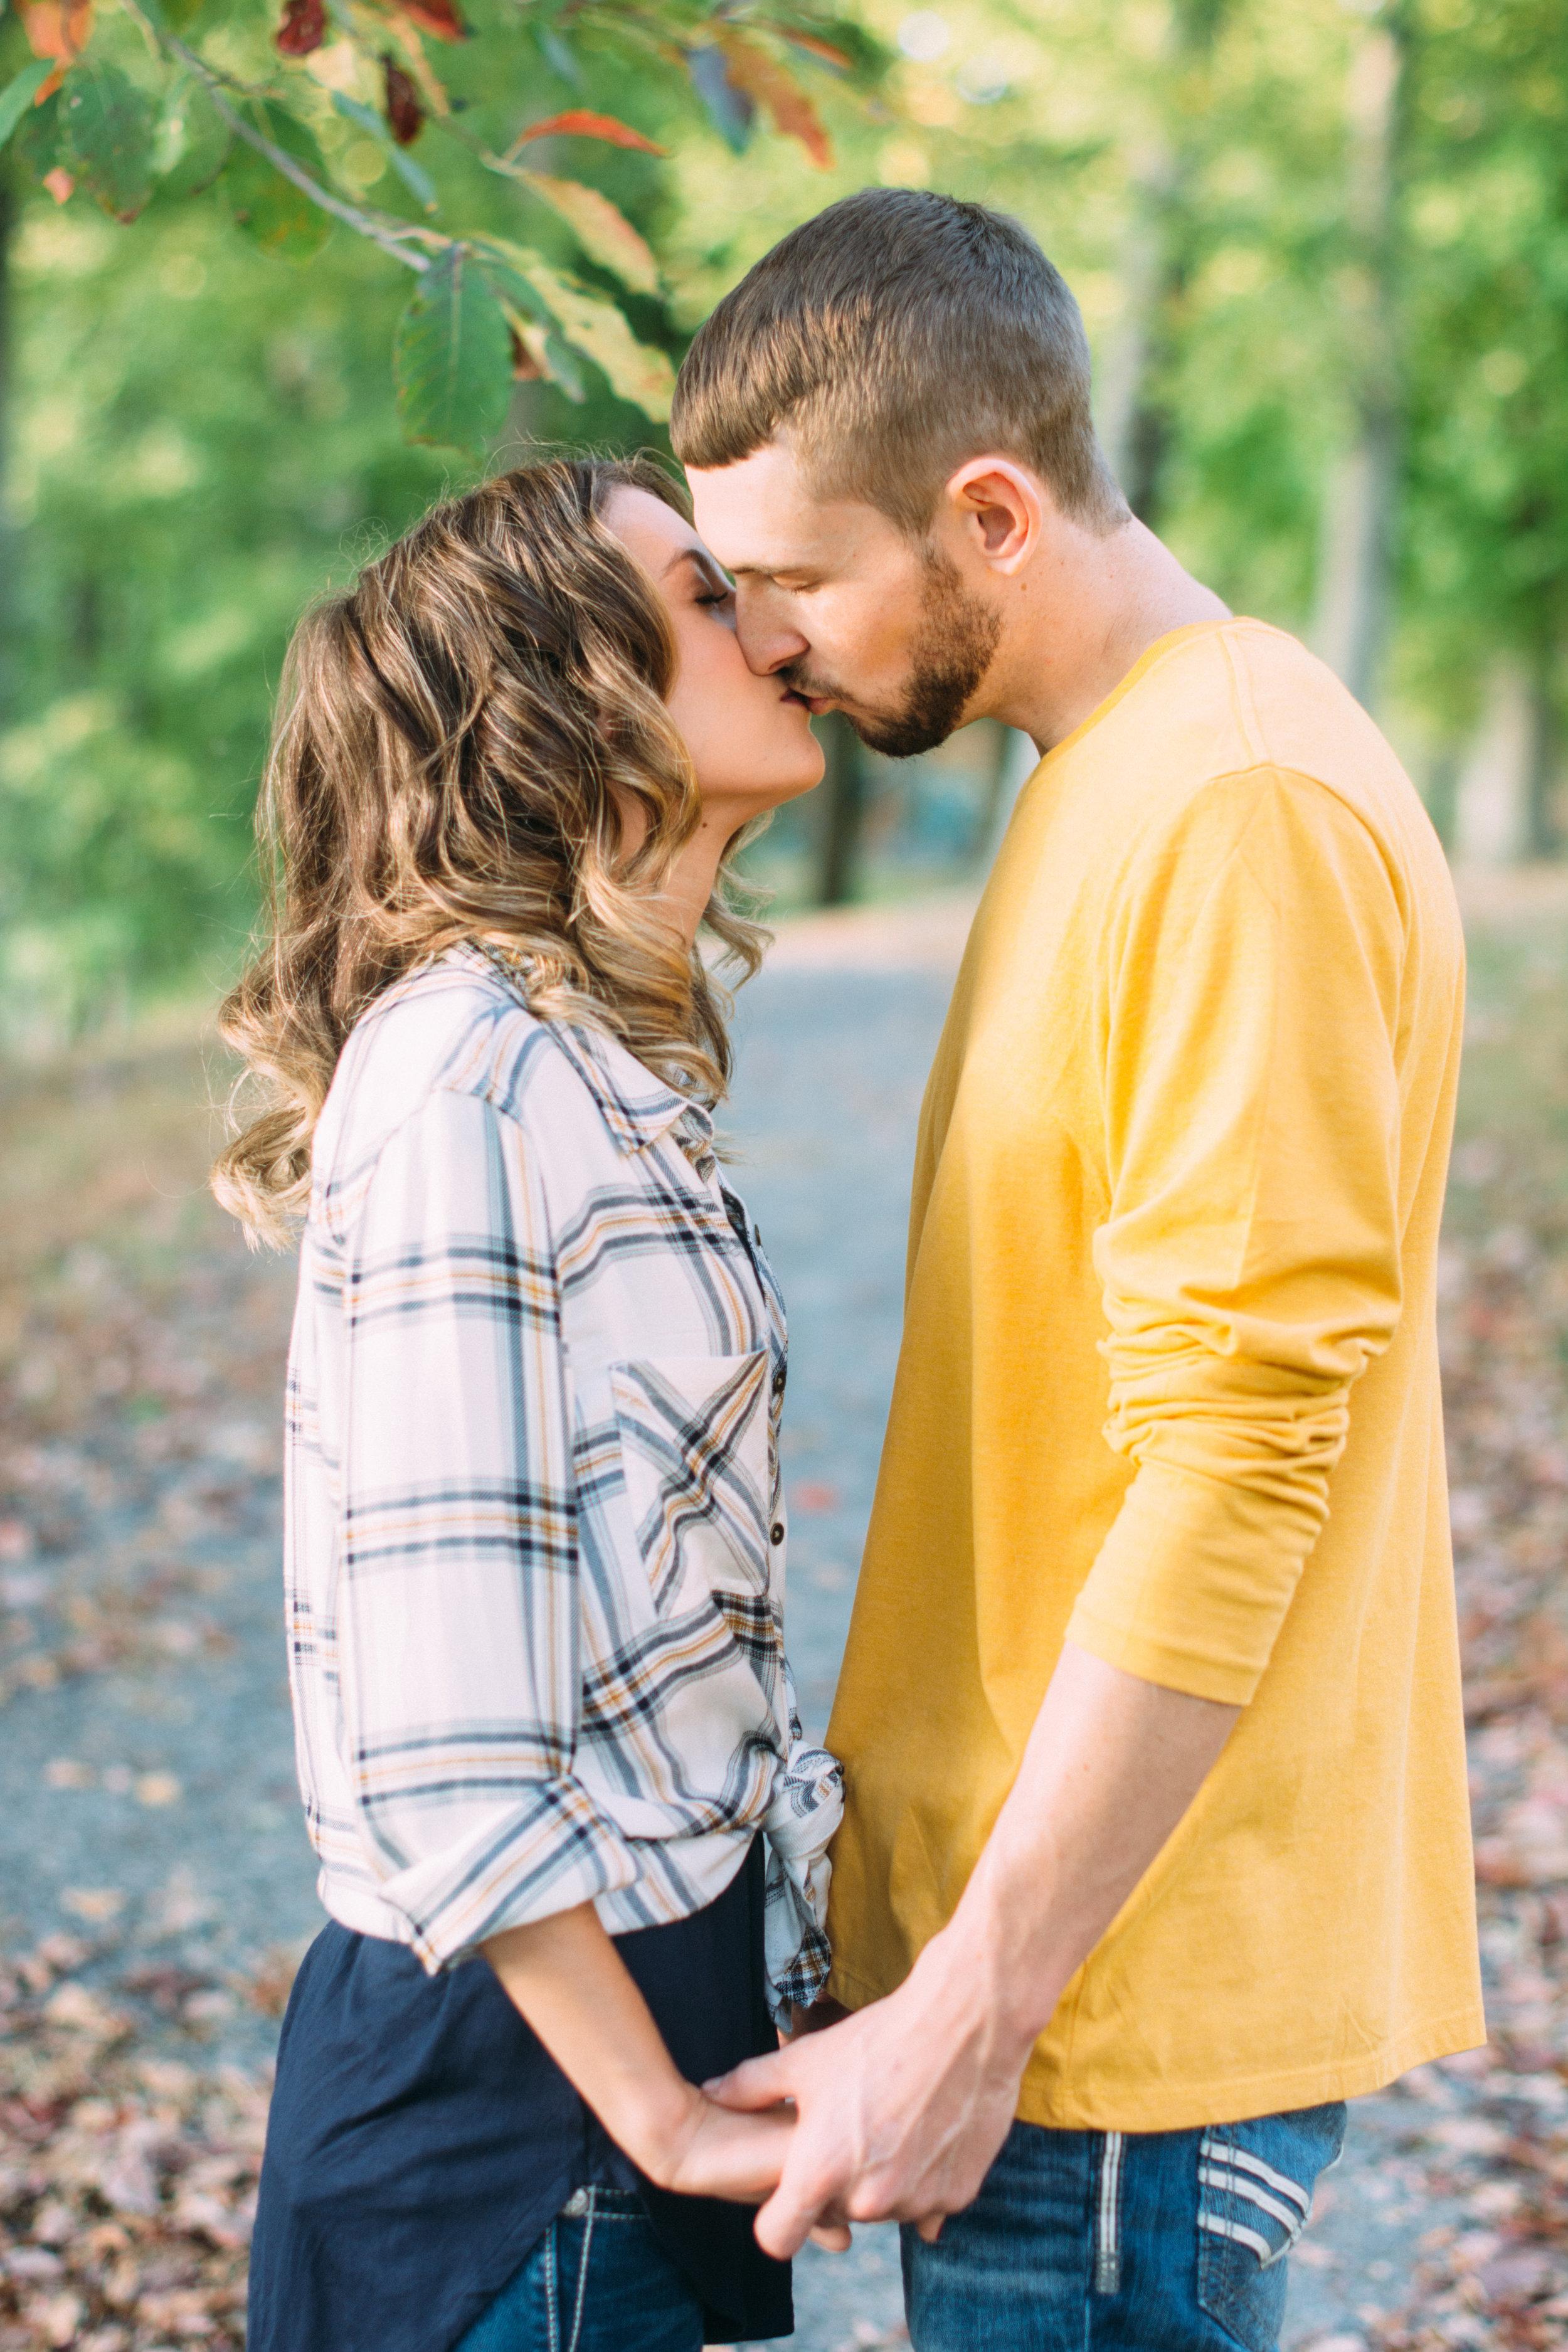 Tiffany-and-Chad-Engagement-52.jpg